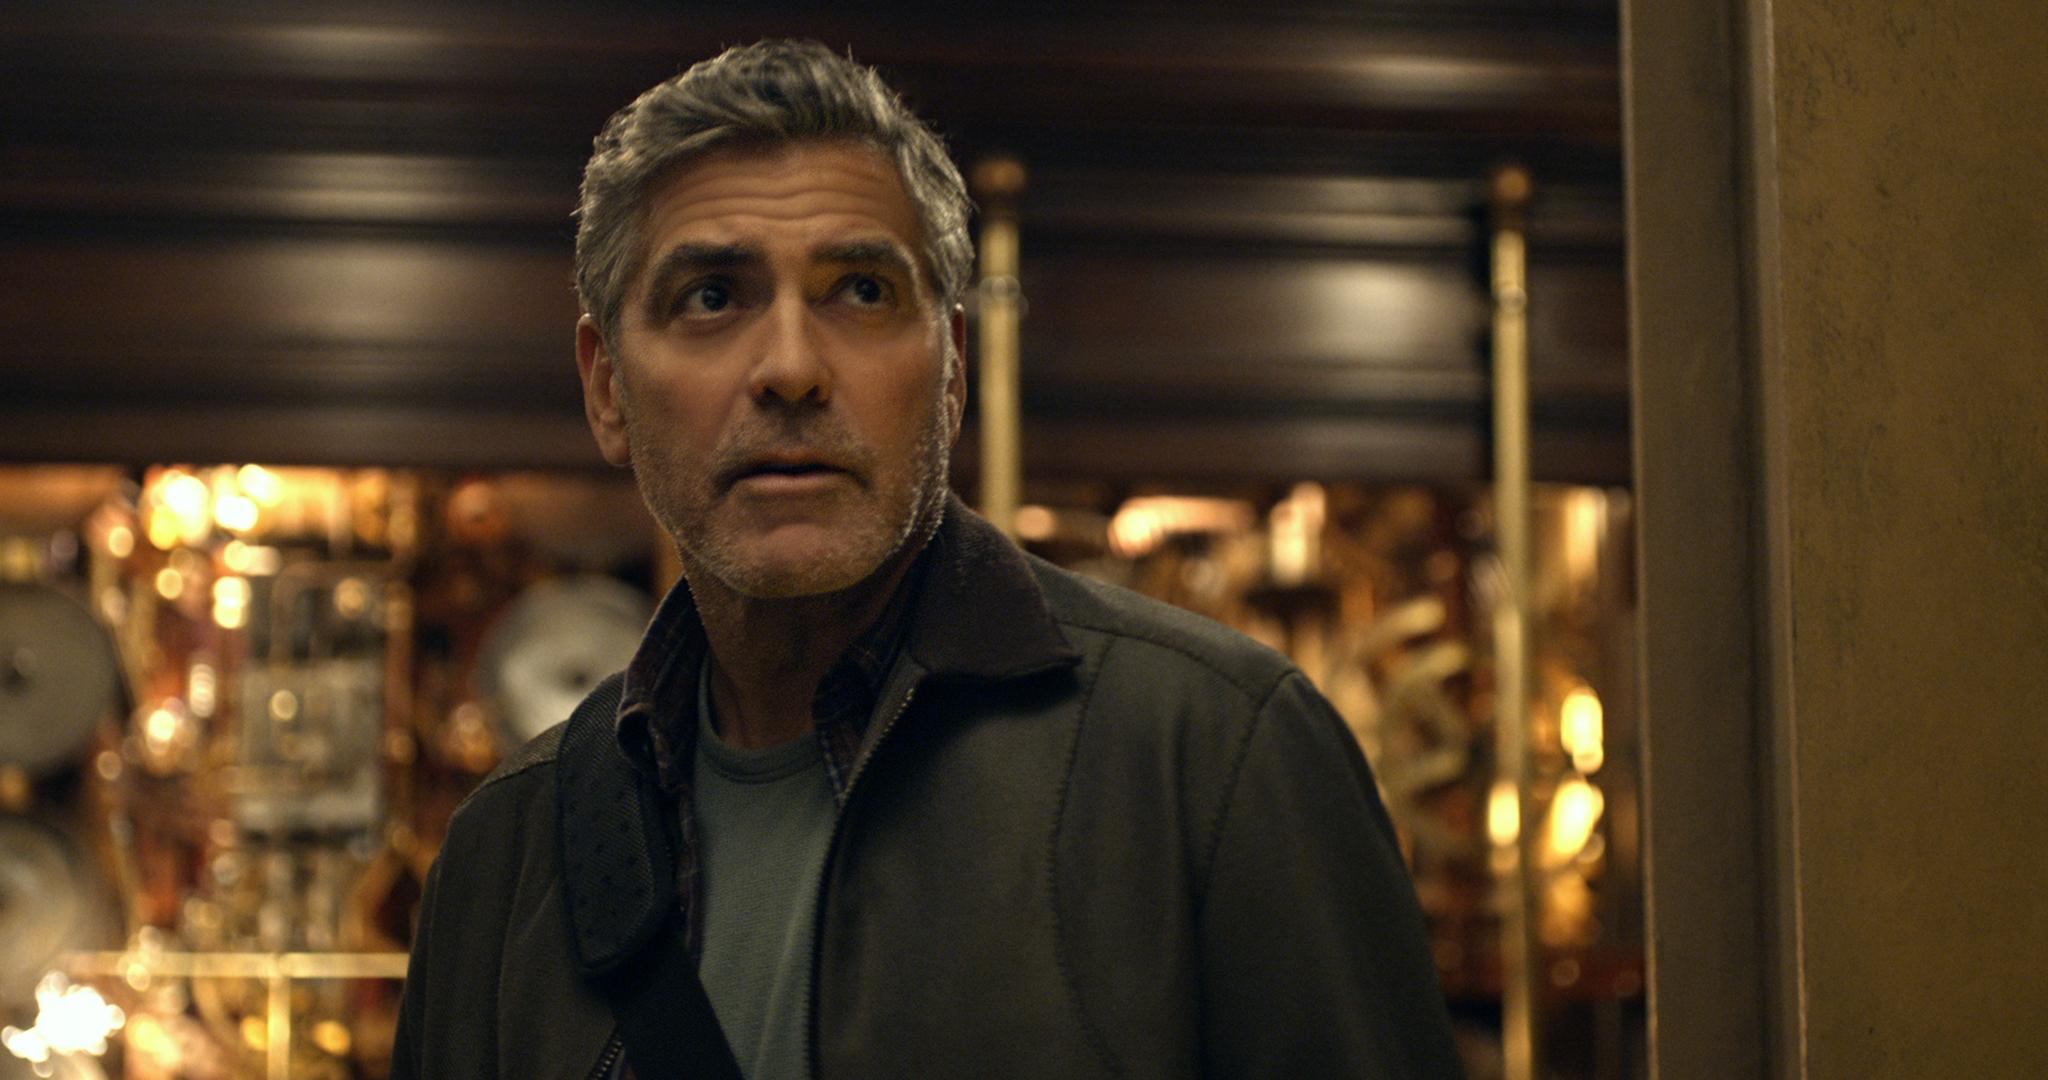 Disney's TOMORROWLAND Frank Walker (George Clooney) Ph: Film Frame ©Disney 2015